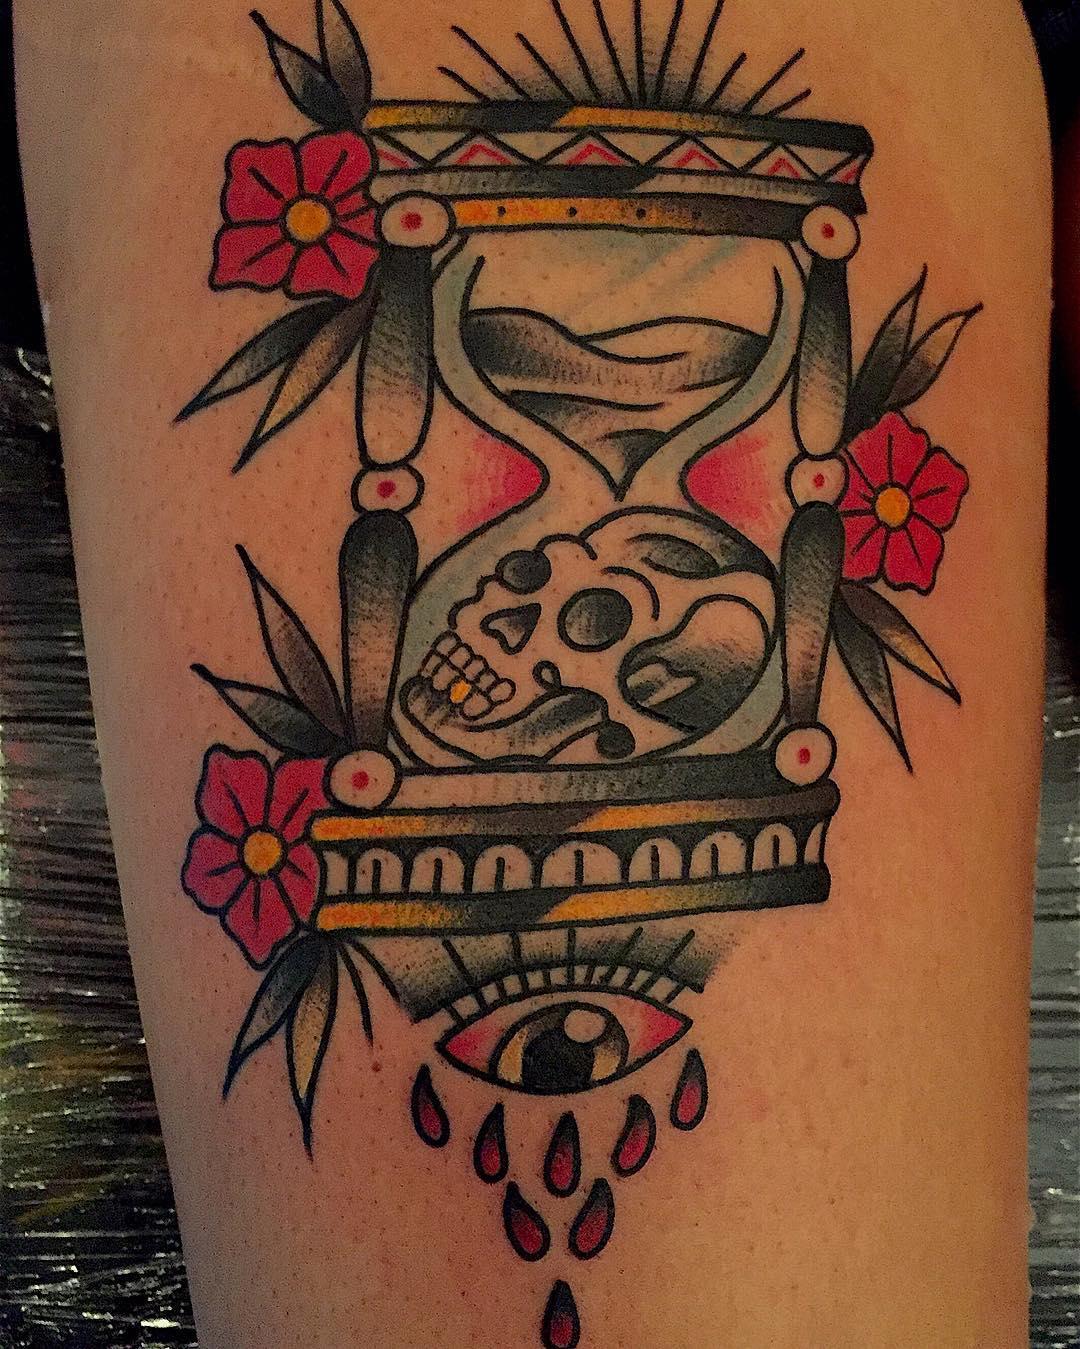 tattooart,madrid,malasa,oldschooltattoo,traditionaltattoo,gato,callepalma,synesthezia,juantabasco,tabascotattooer,igersmadrid,followme,follow4follow,madridarttattoo,linner,thisiscolor,radtrad,madrile,madridfusion,malasa,coconut,callepez,bestattooers,hourglass